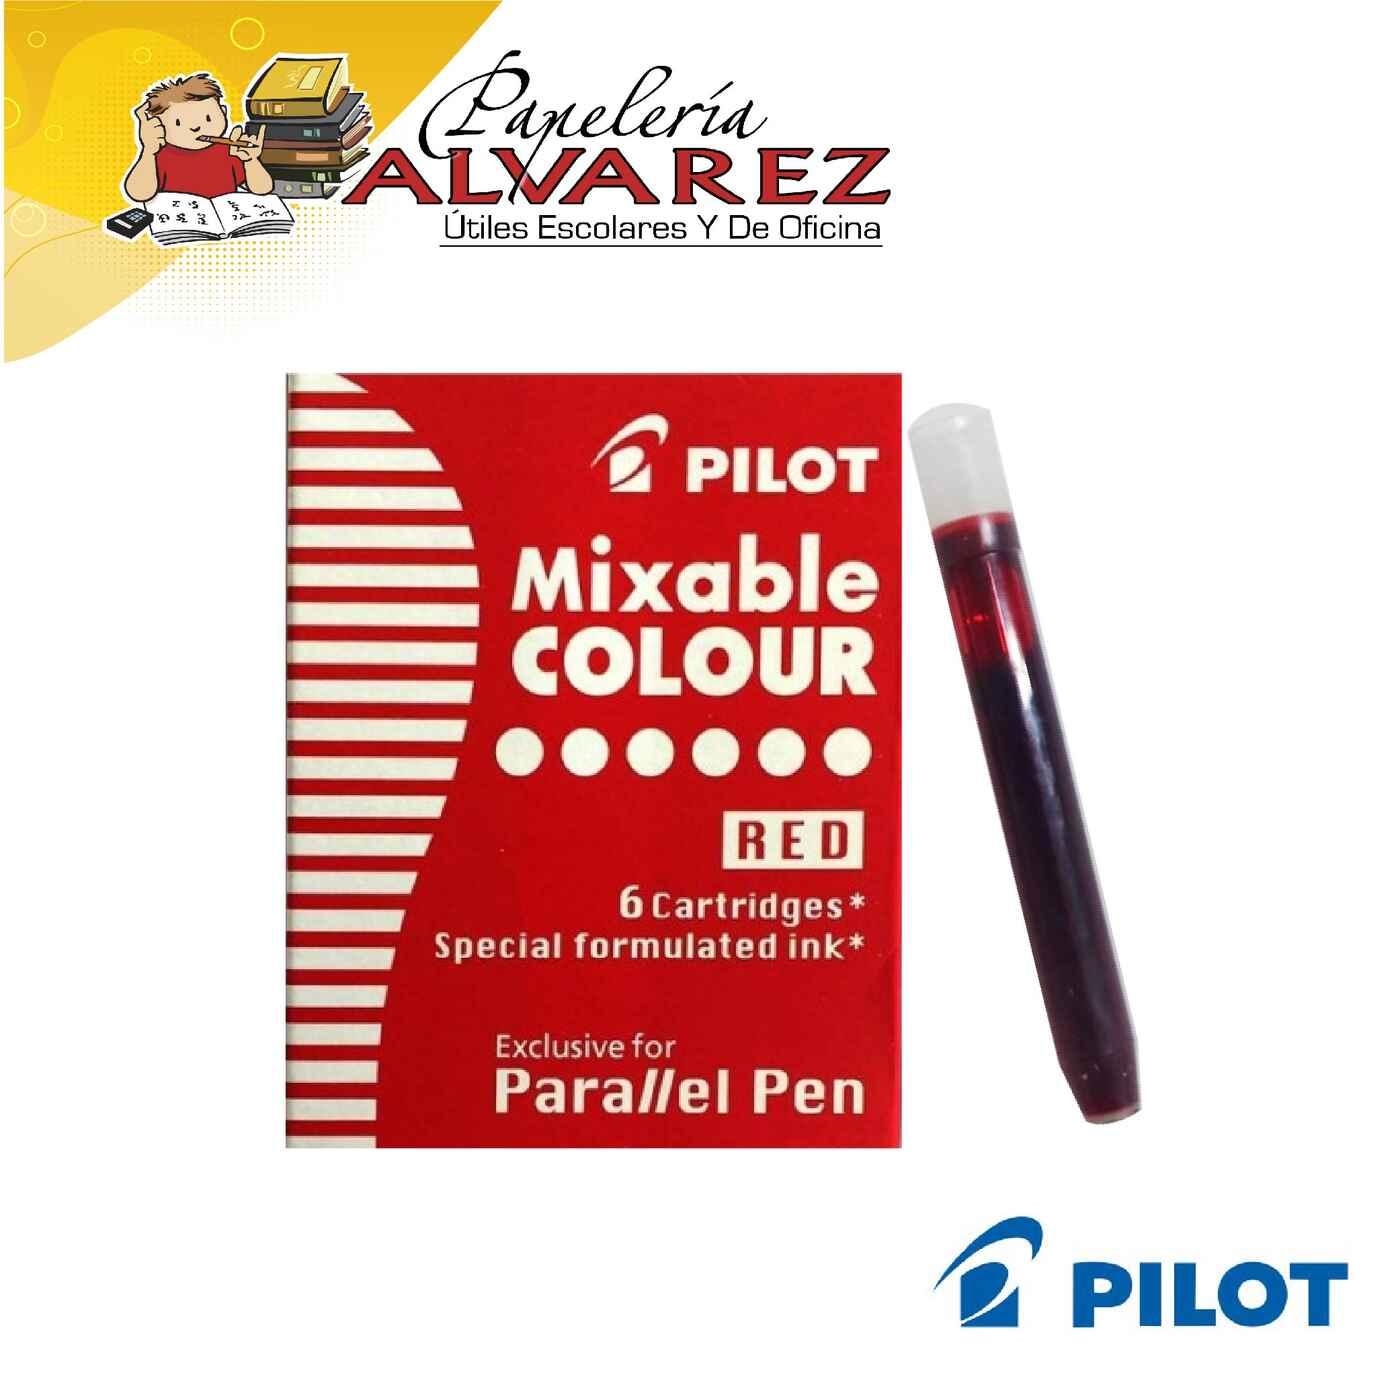 CARTUCHO PARA PLUMA PEN X 6 PILOT